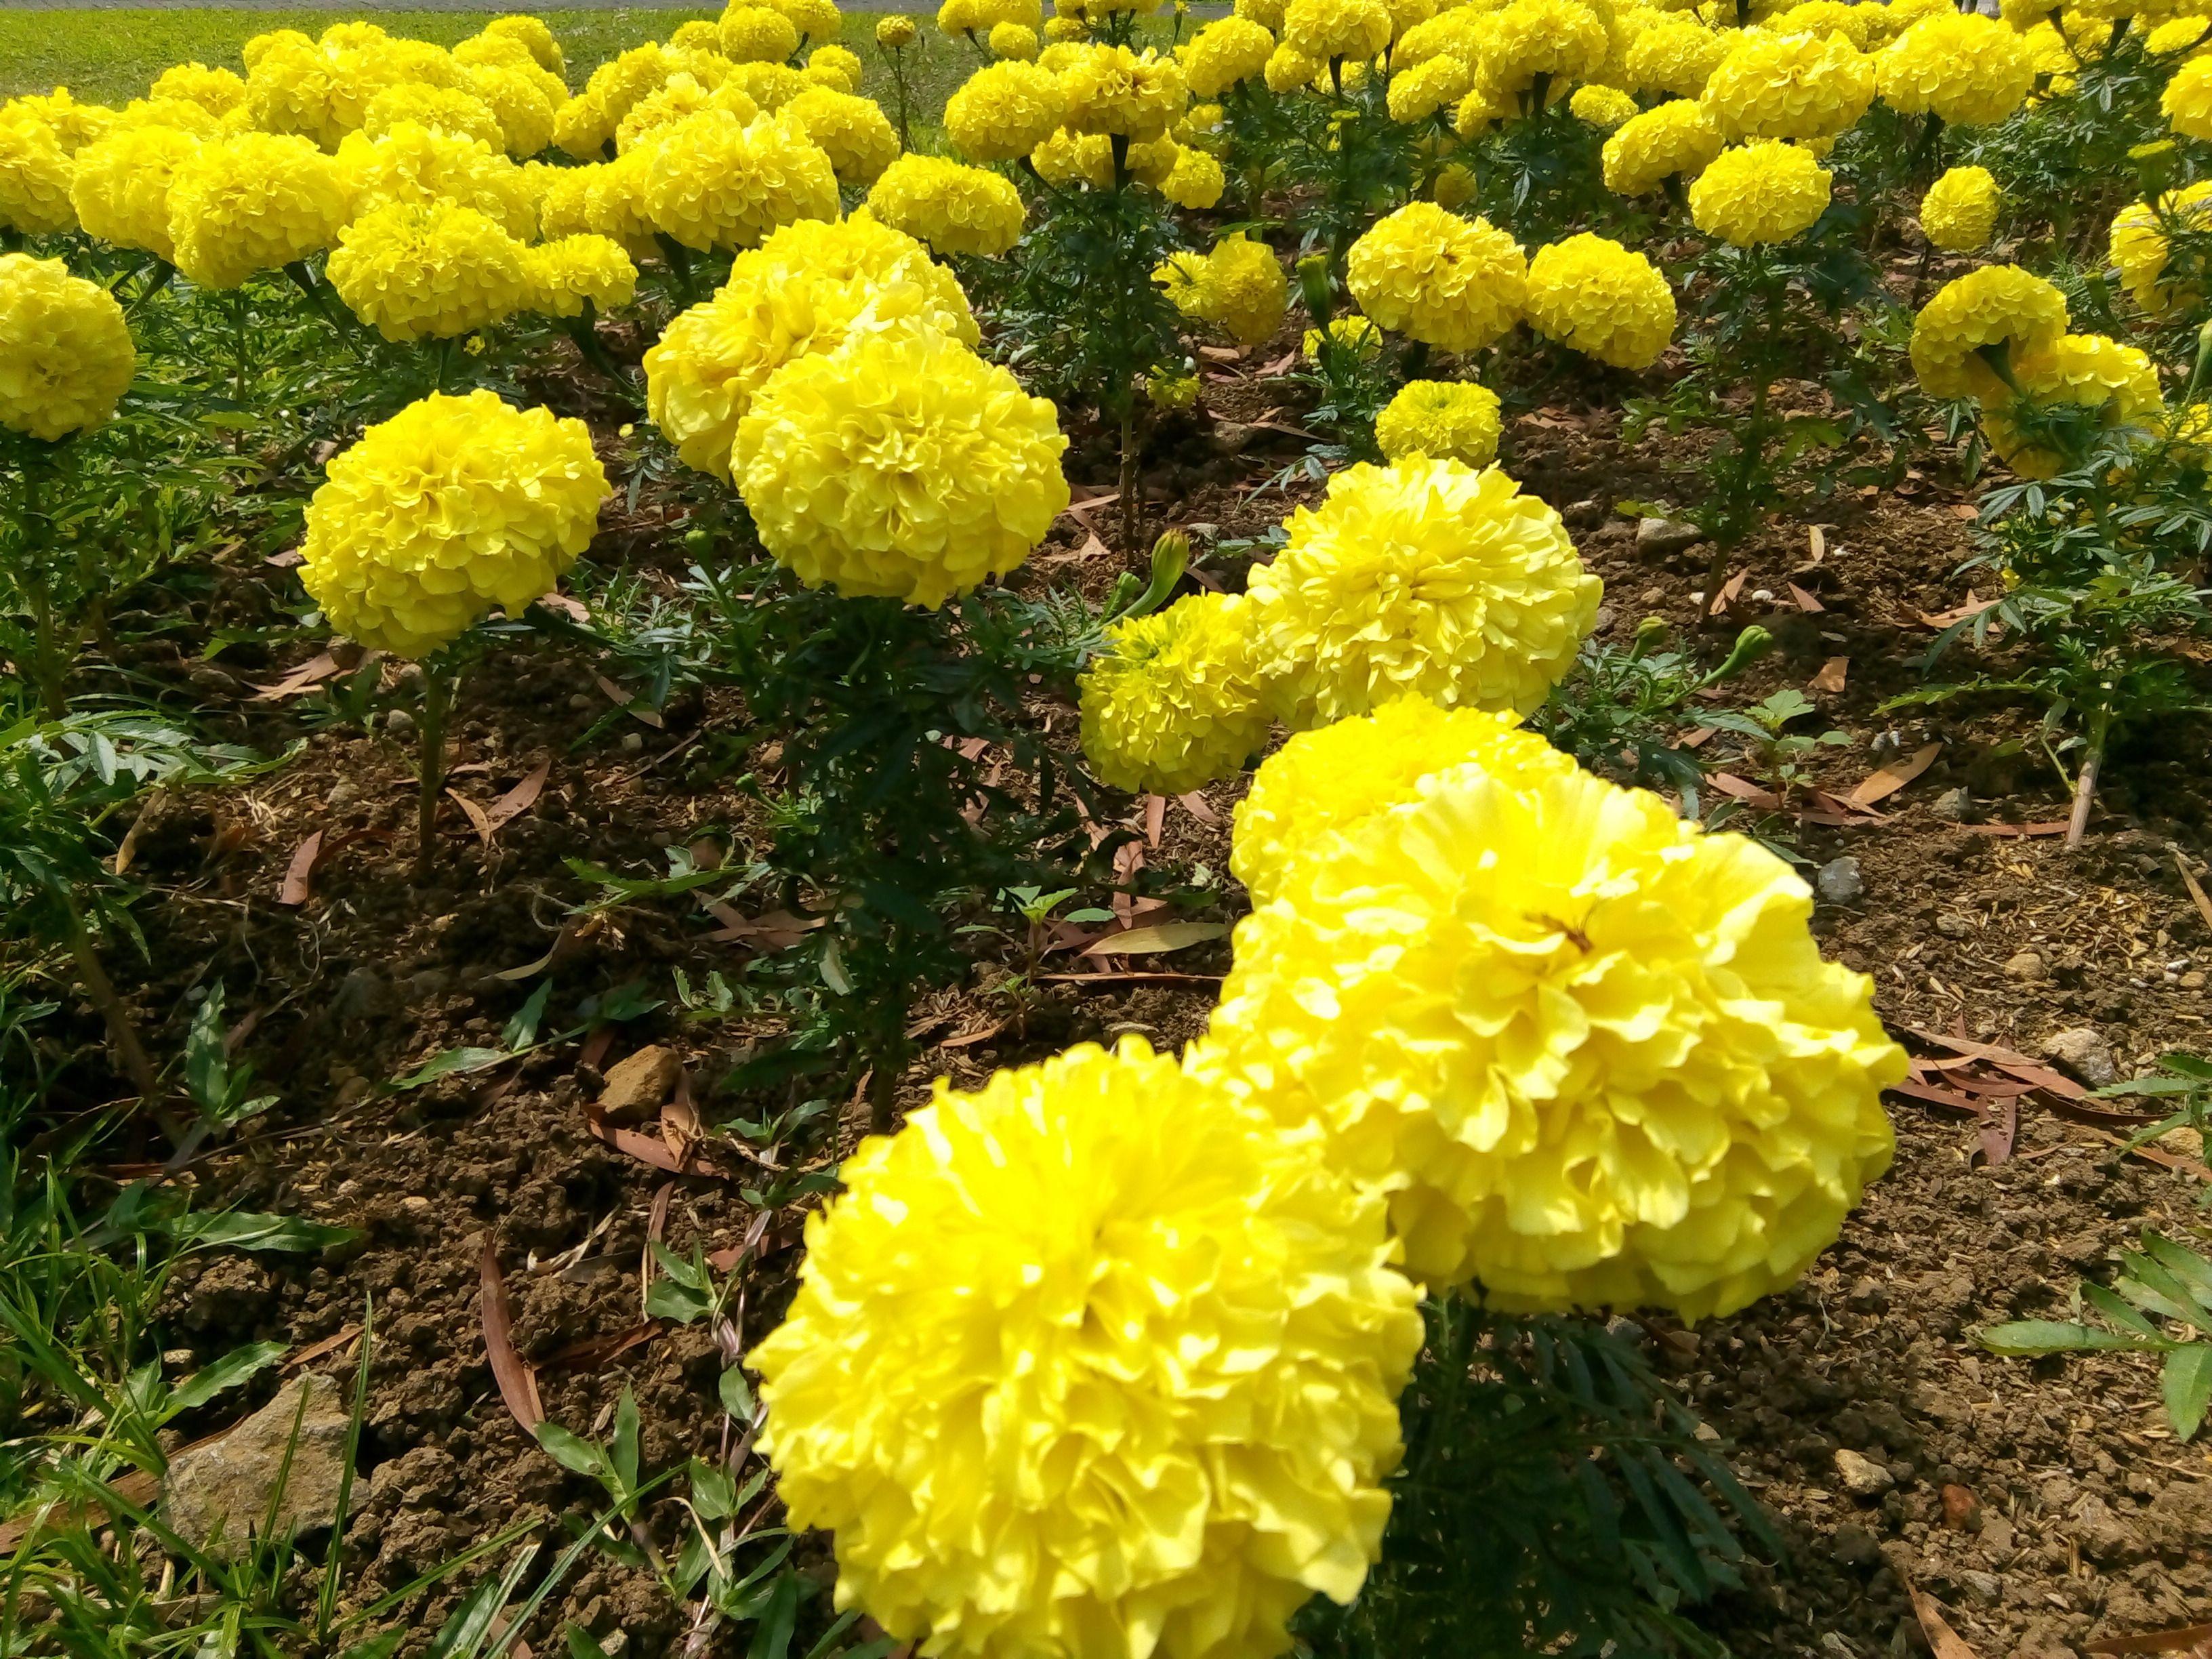 Pin Oleh Tono Agus Di Taman Bunga Taman Bunga Bunga Taman